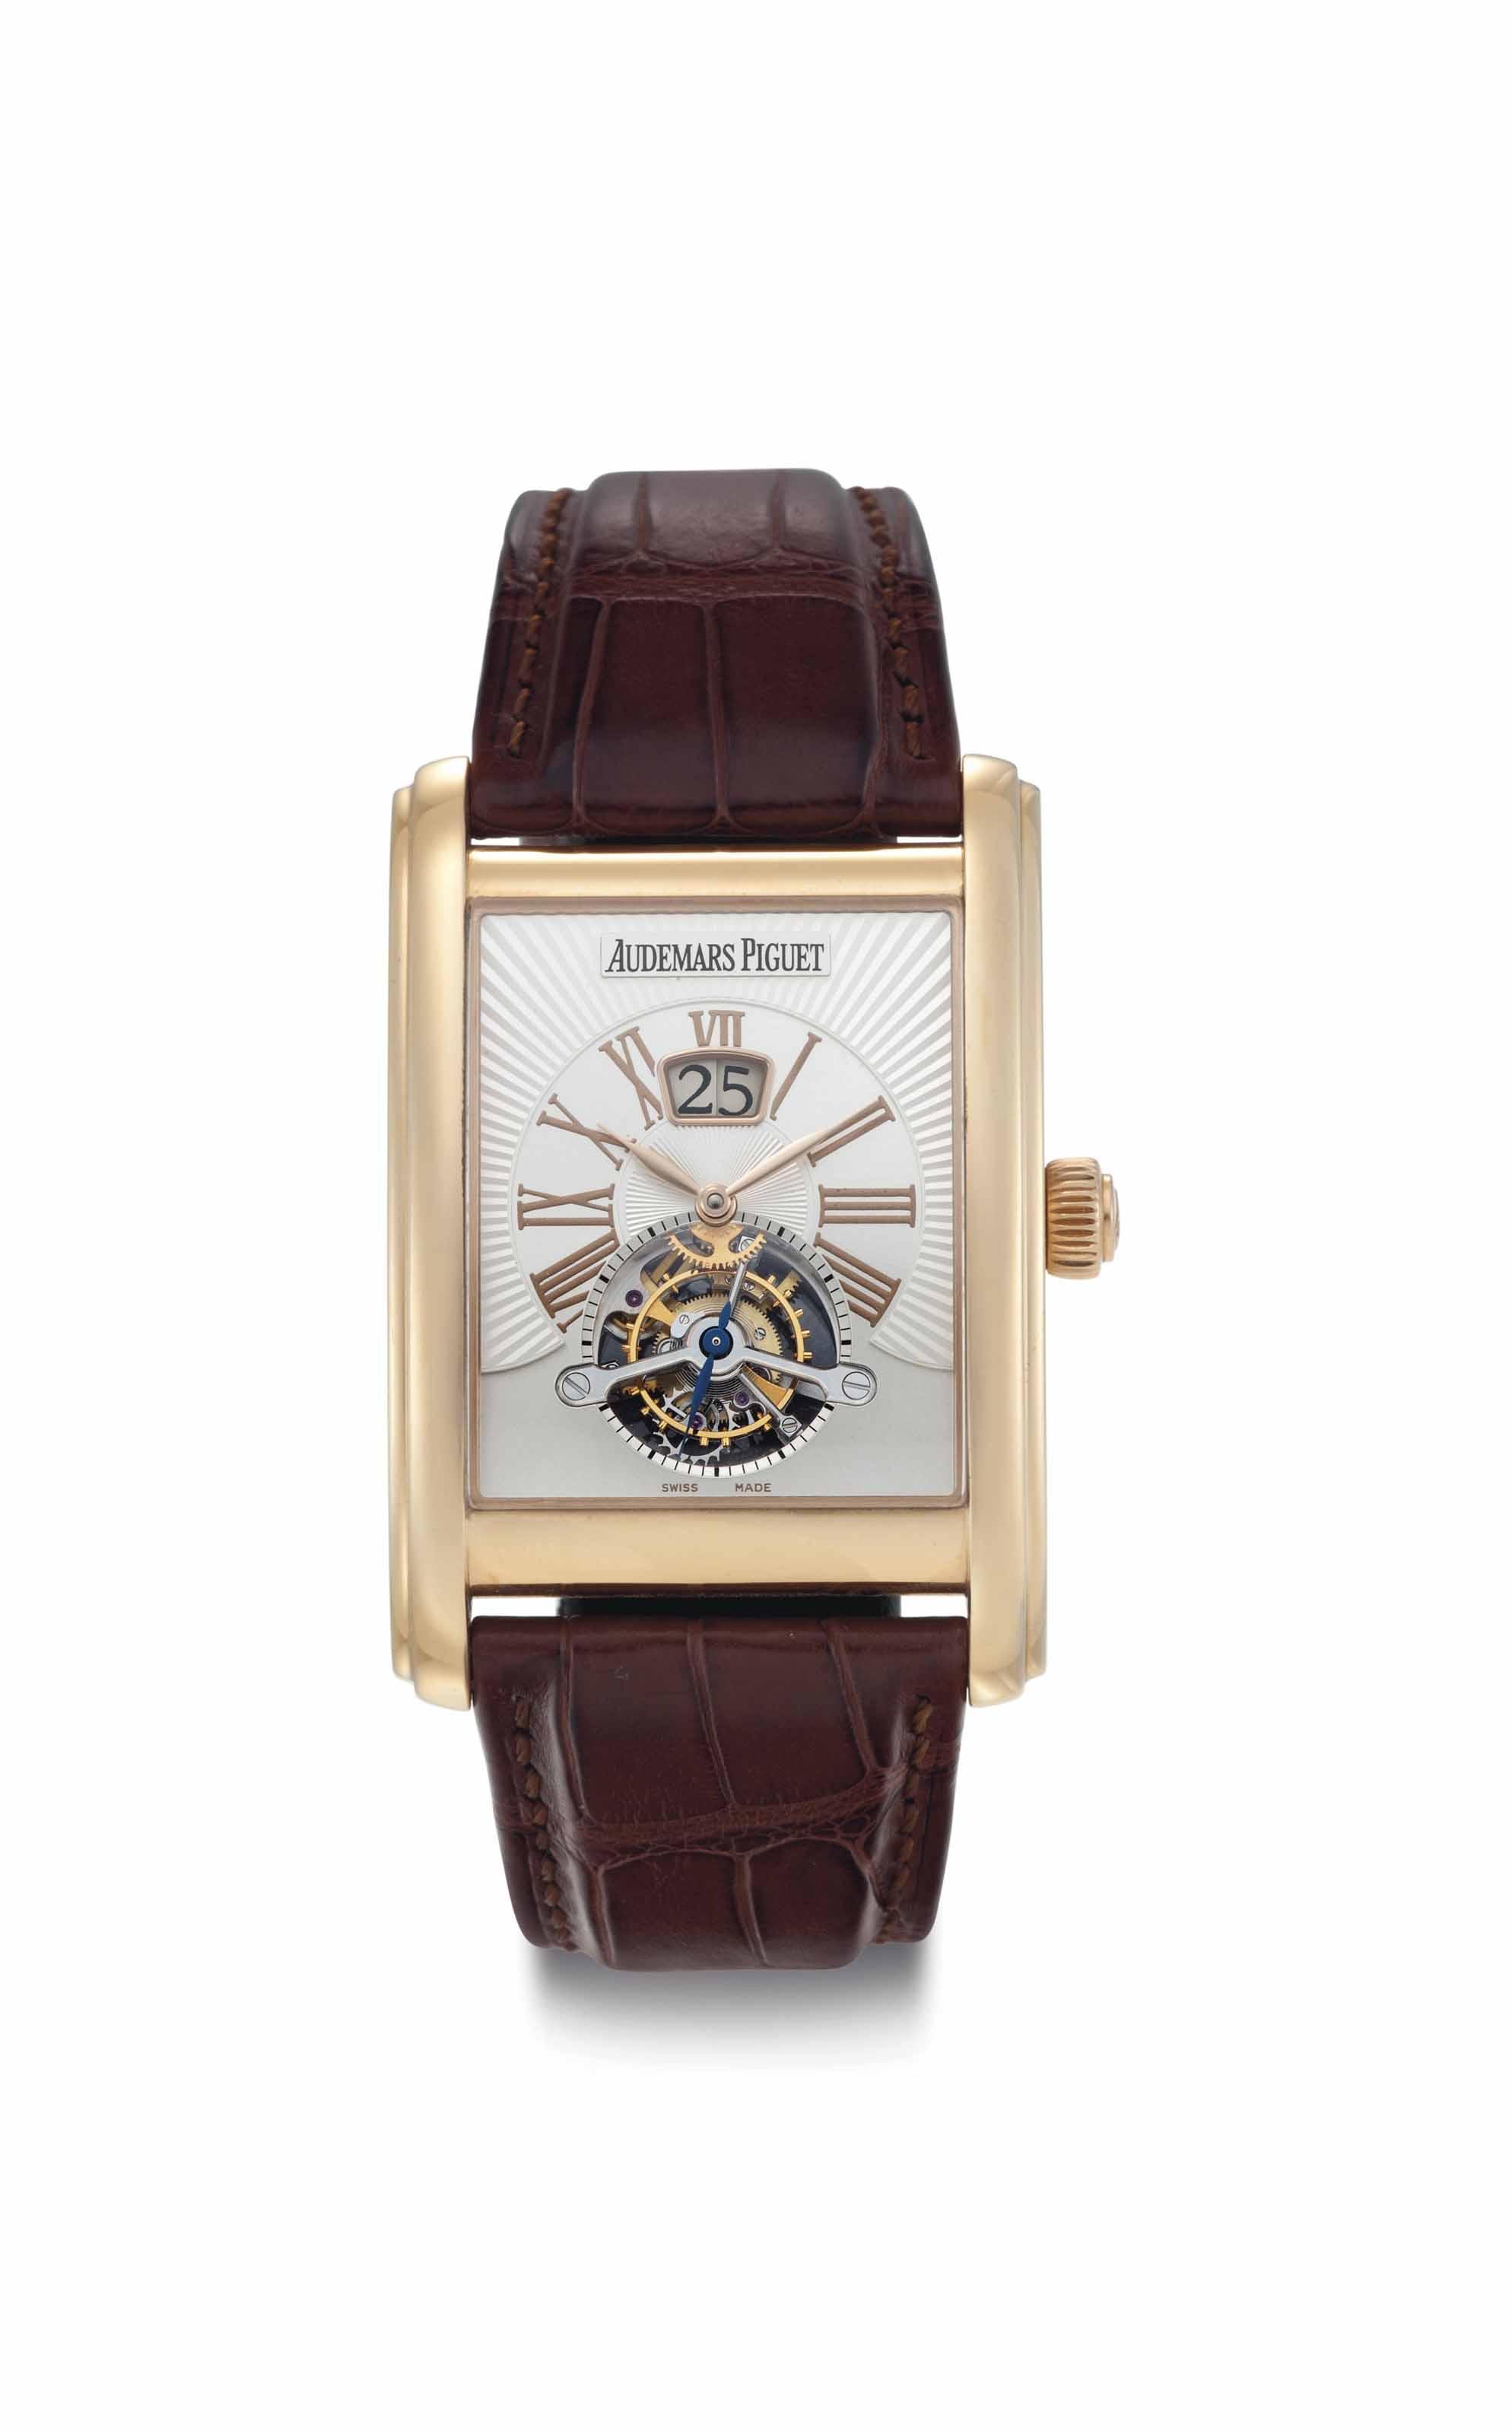 Audemars Piguet. A Fine and Rare 18k Pink Gold Wristwatch with Tourbillon and Date